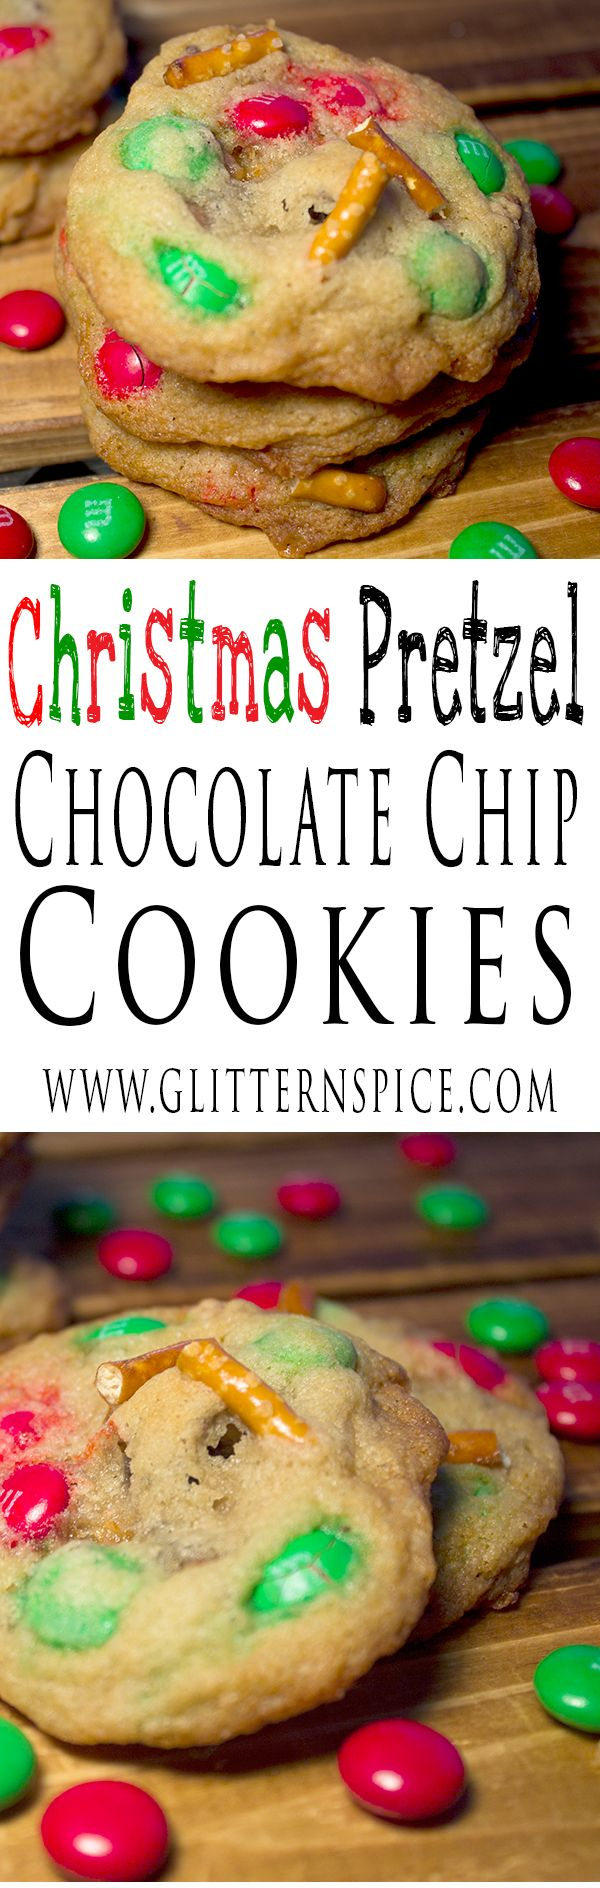 Christmas Pretzel Chocolate Chip Cookies Recipe